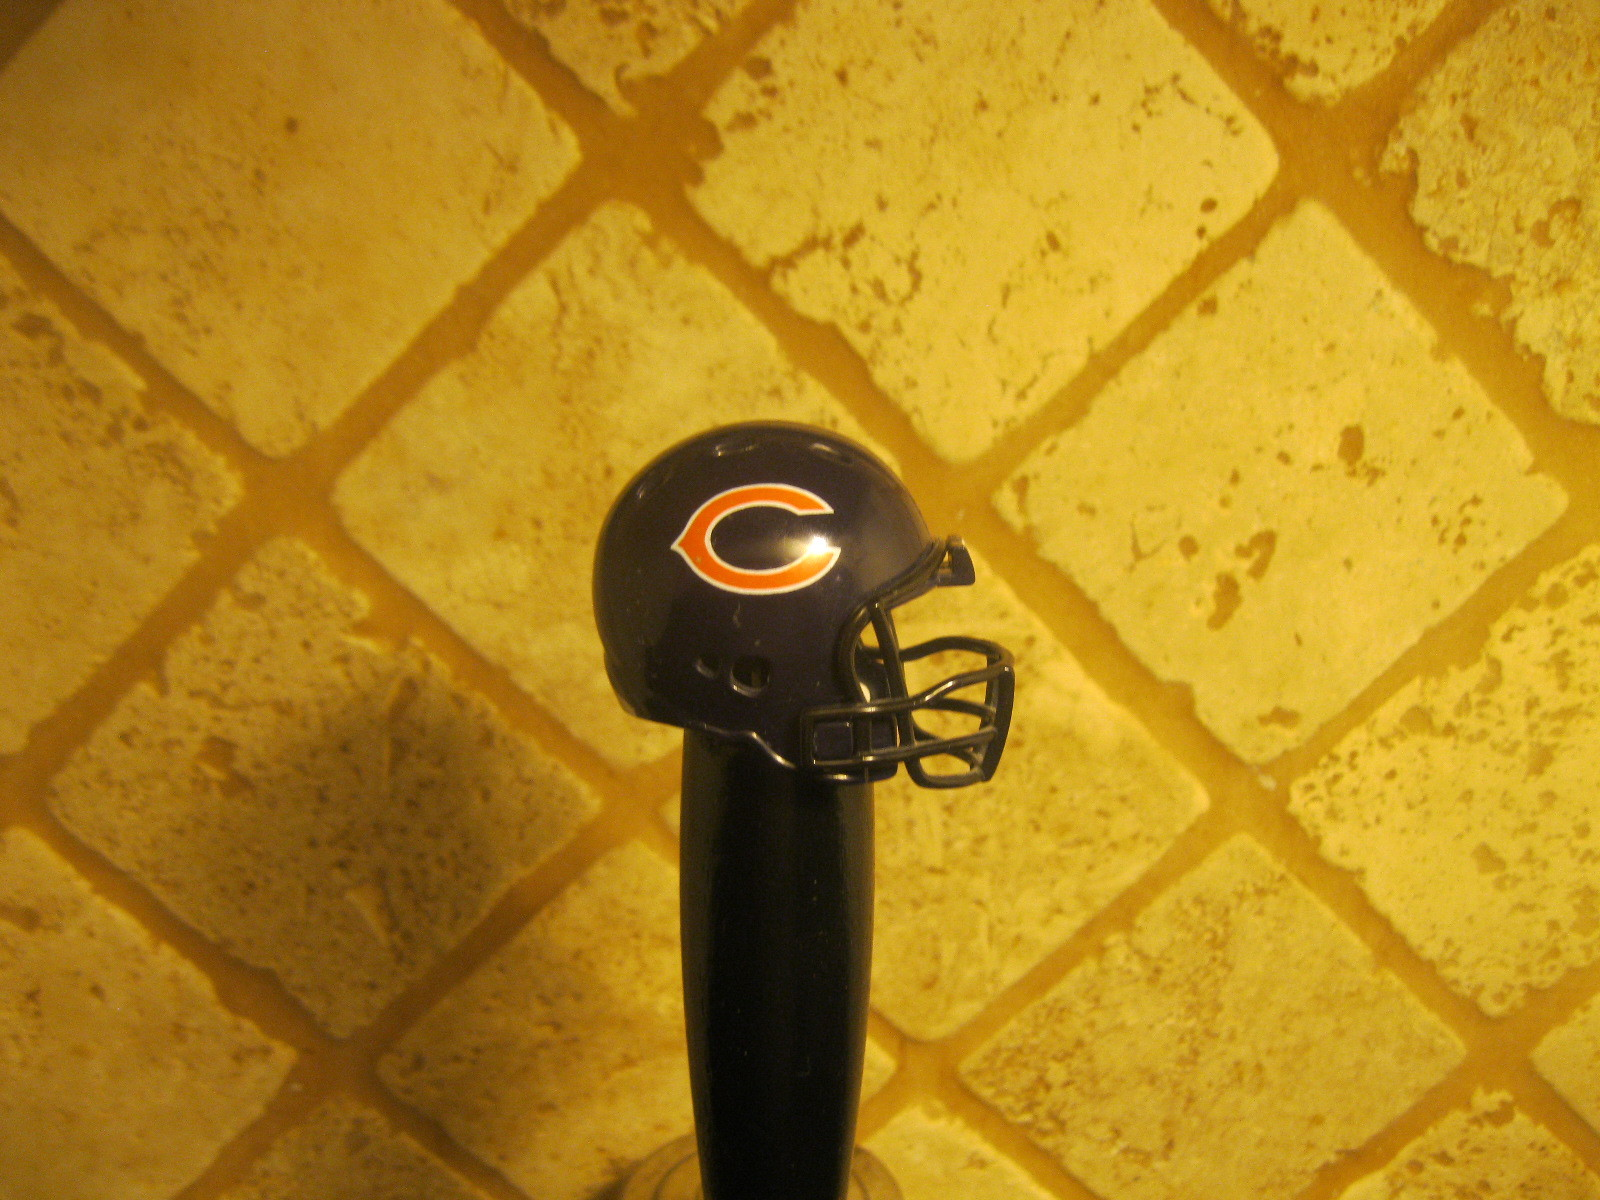 NFL Chicago Bears Kegerator Beer Tap Handle Football Helmet Team Bar Brew Sport - $31.63